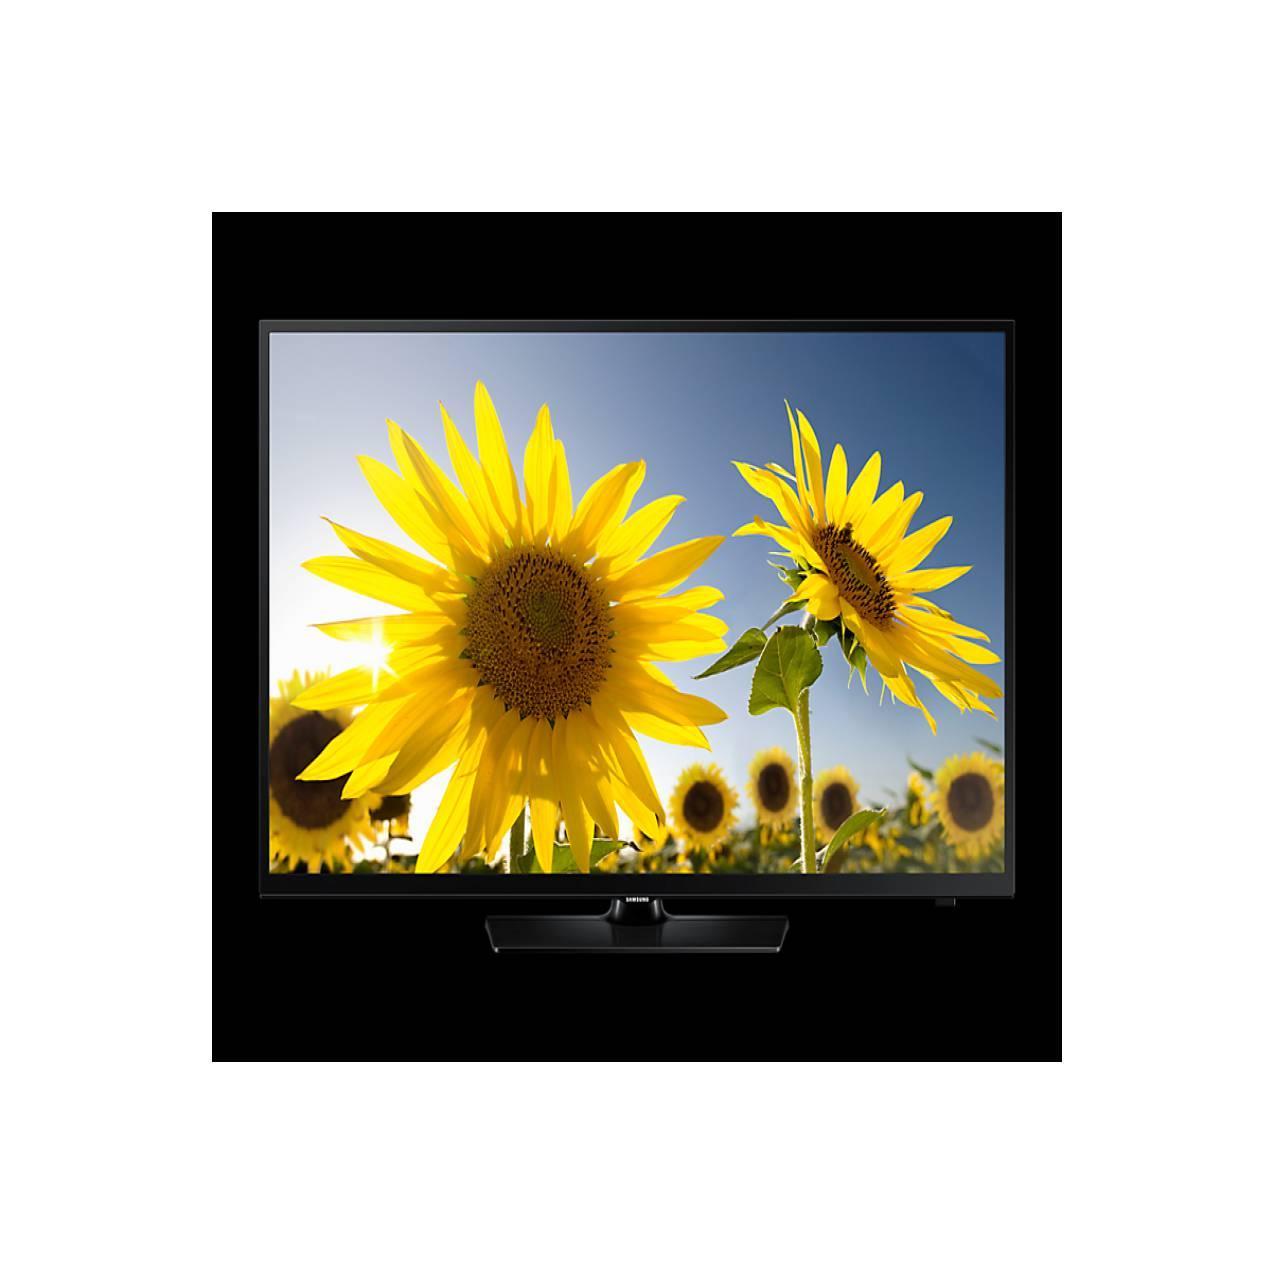 TV LED Samsung 24 HD Flat H4150